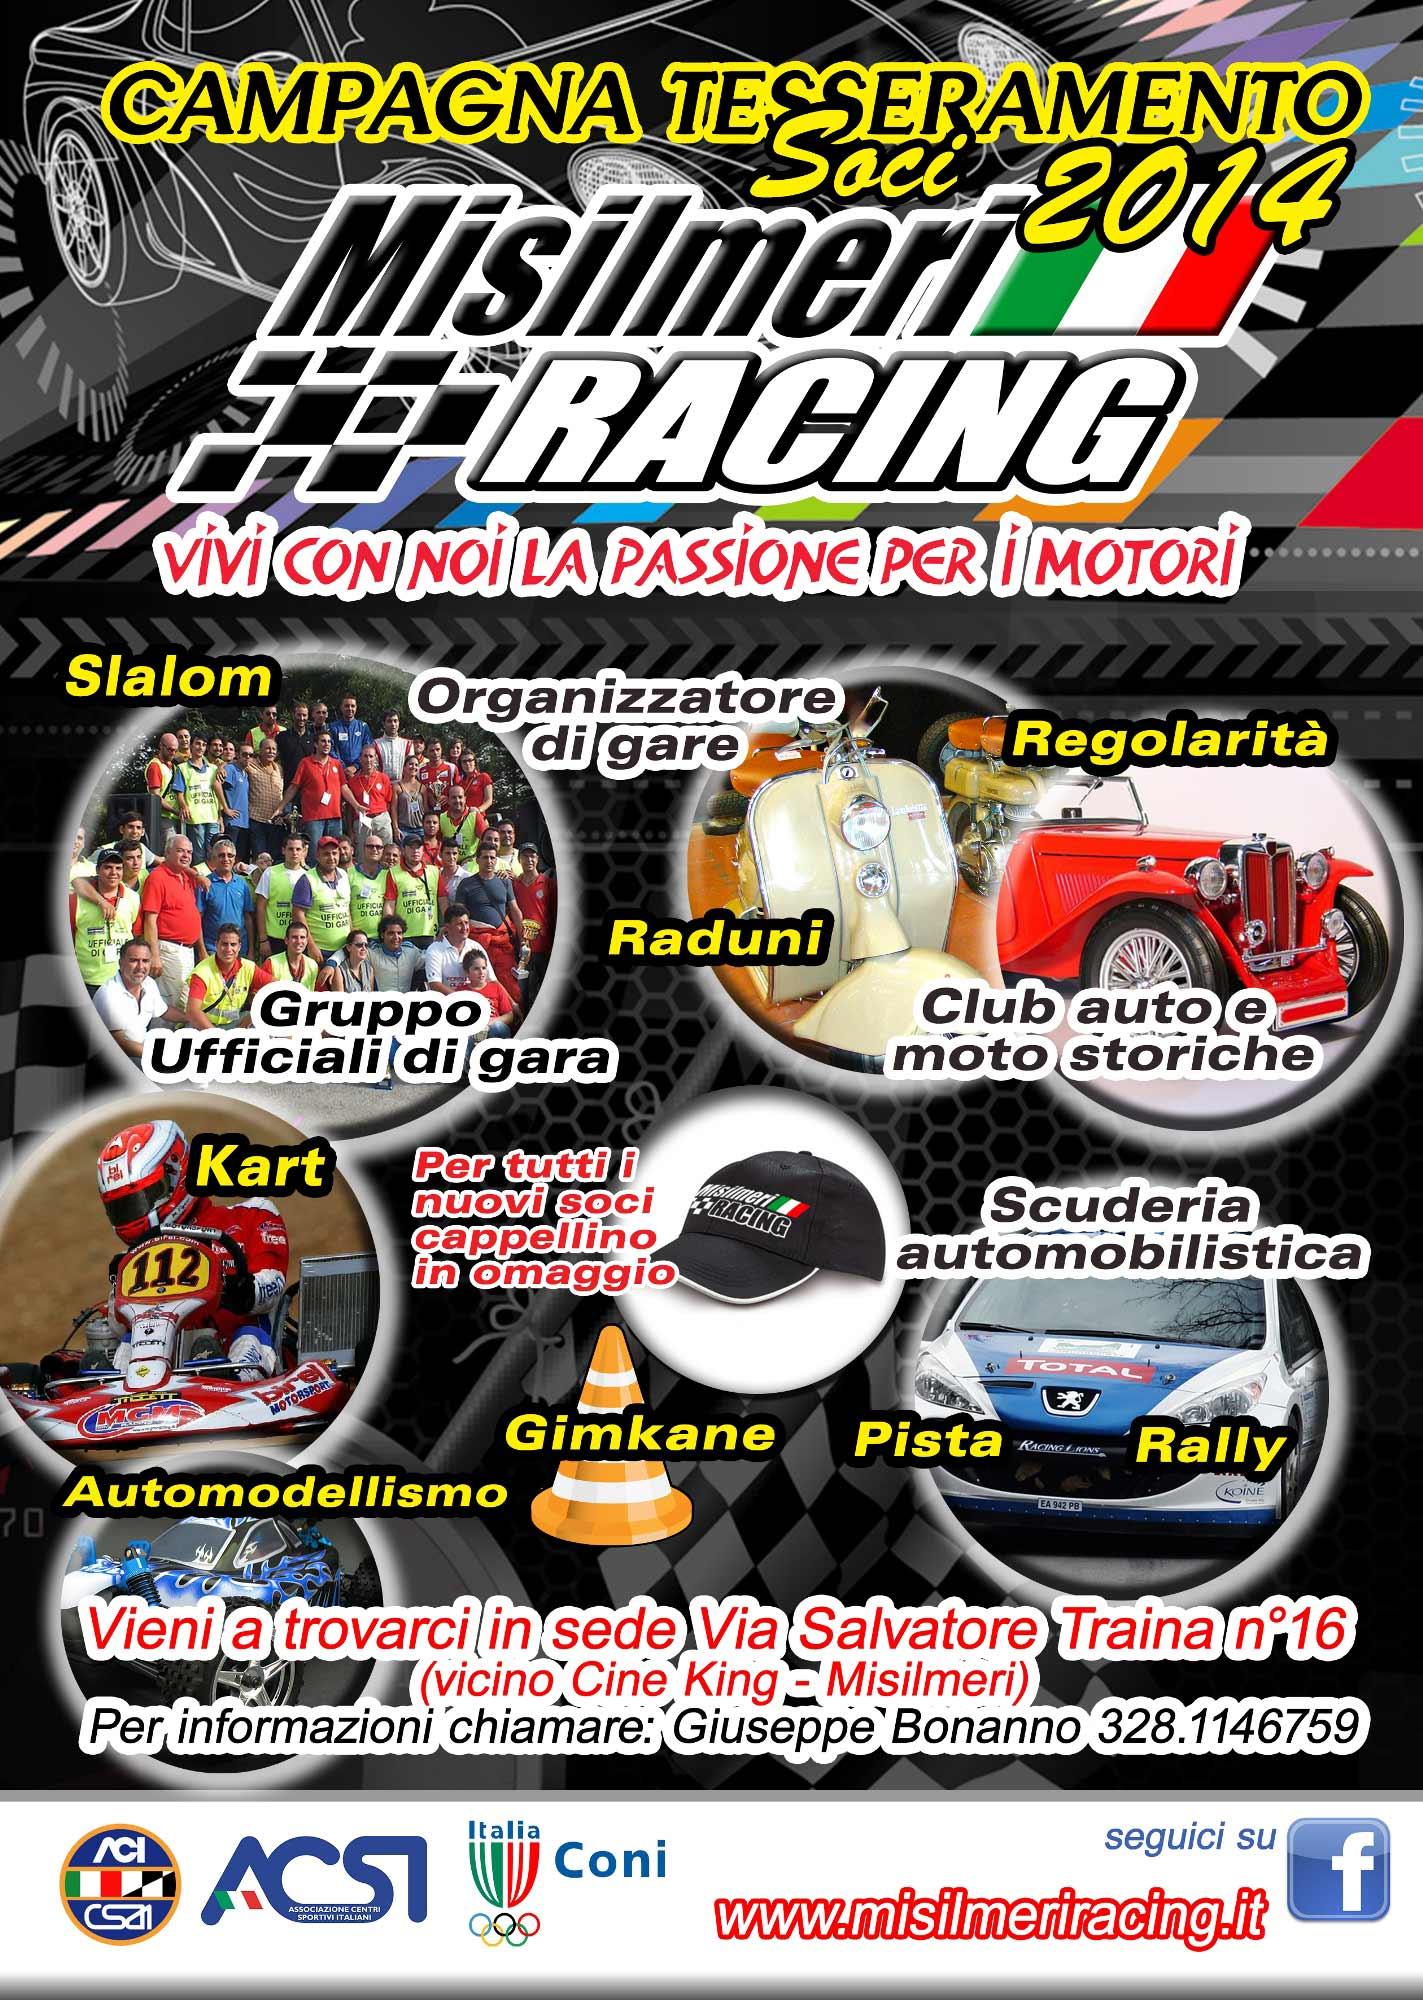 Misilmeri Racing: aperta la campagna soci 2014